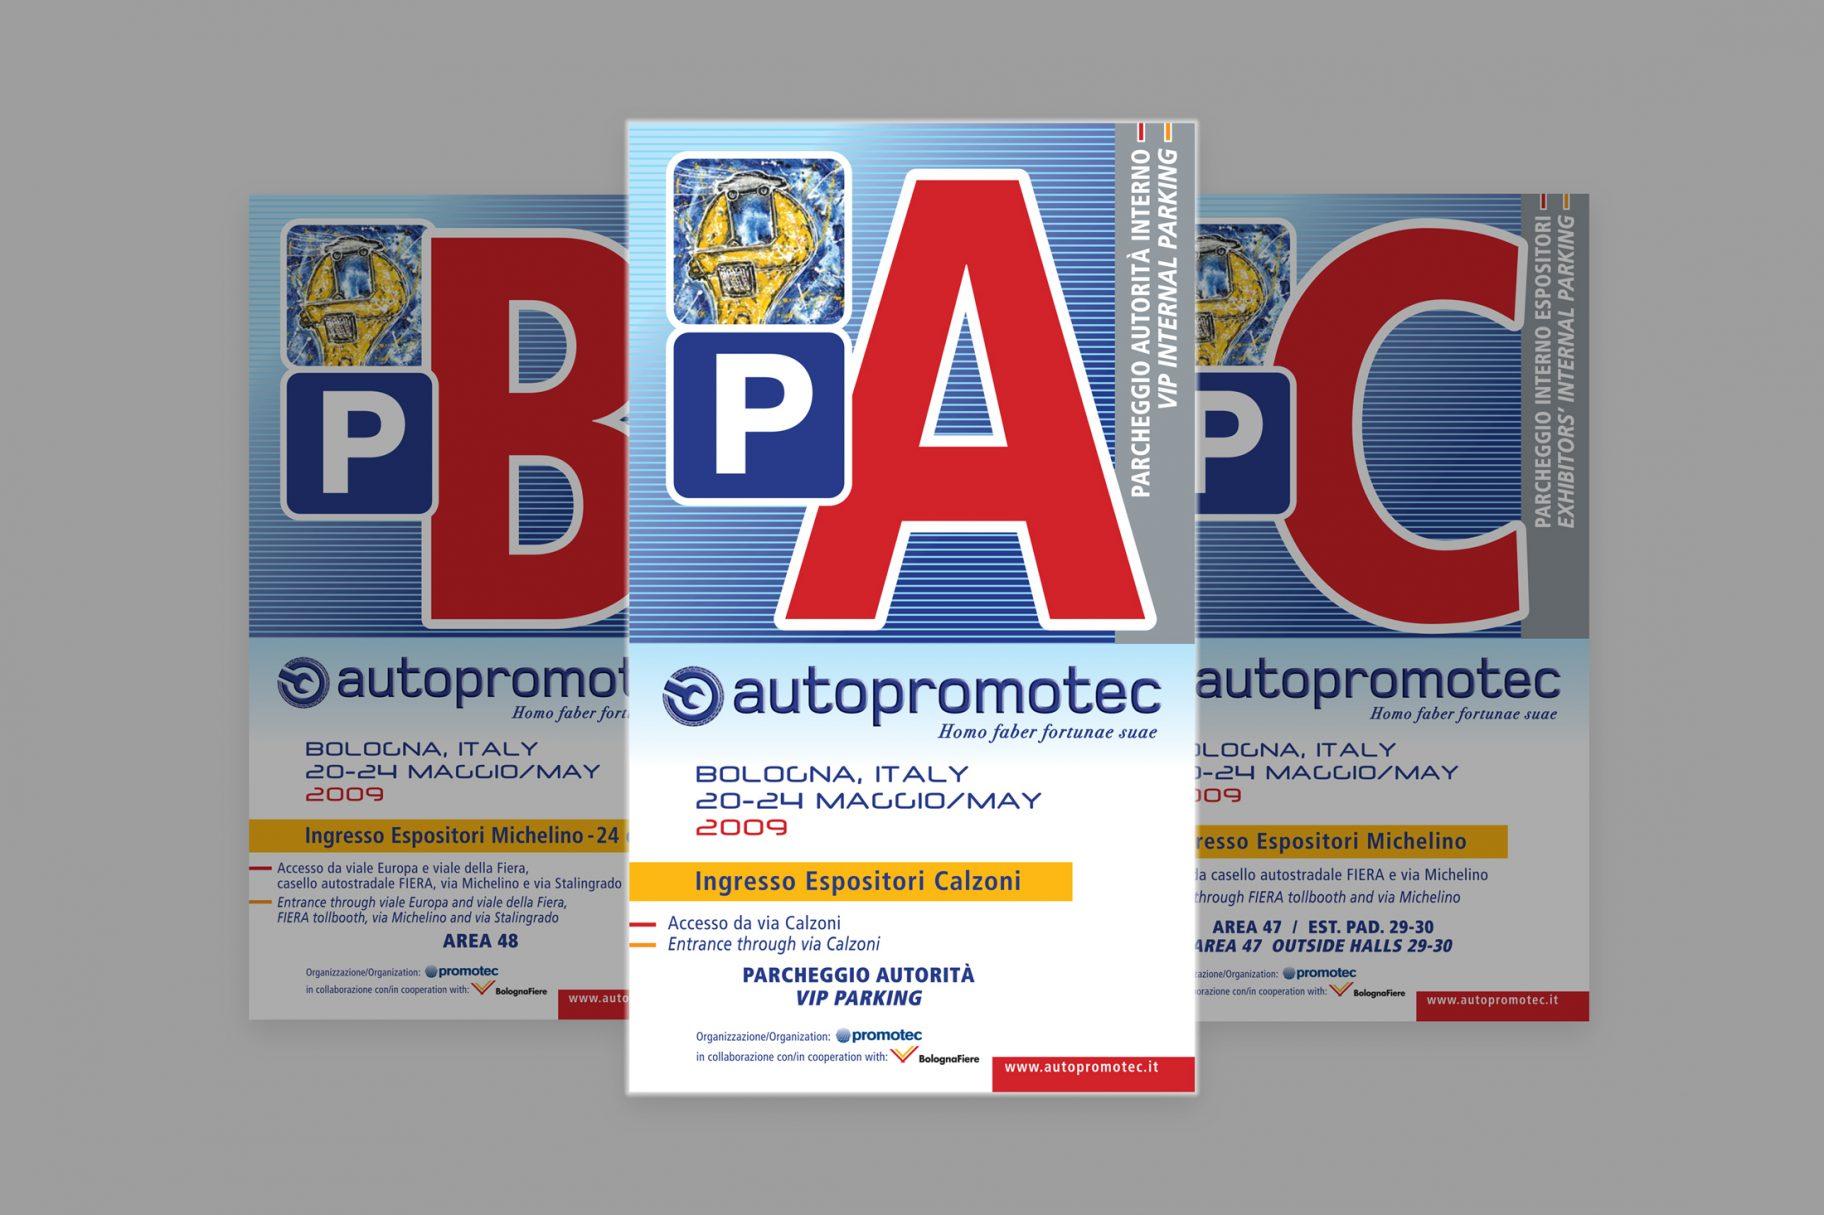 Autopromotec-fiera-2009-pass-parcheggio